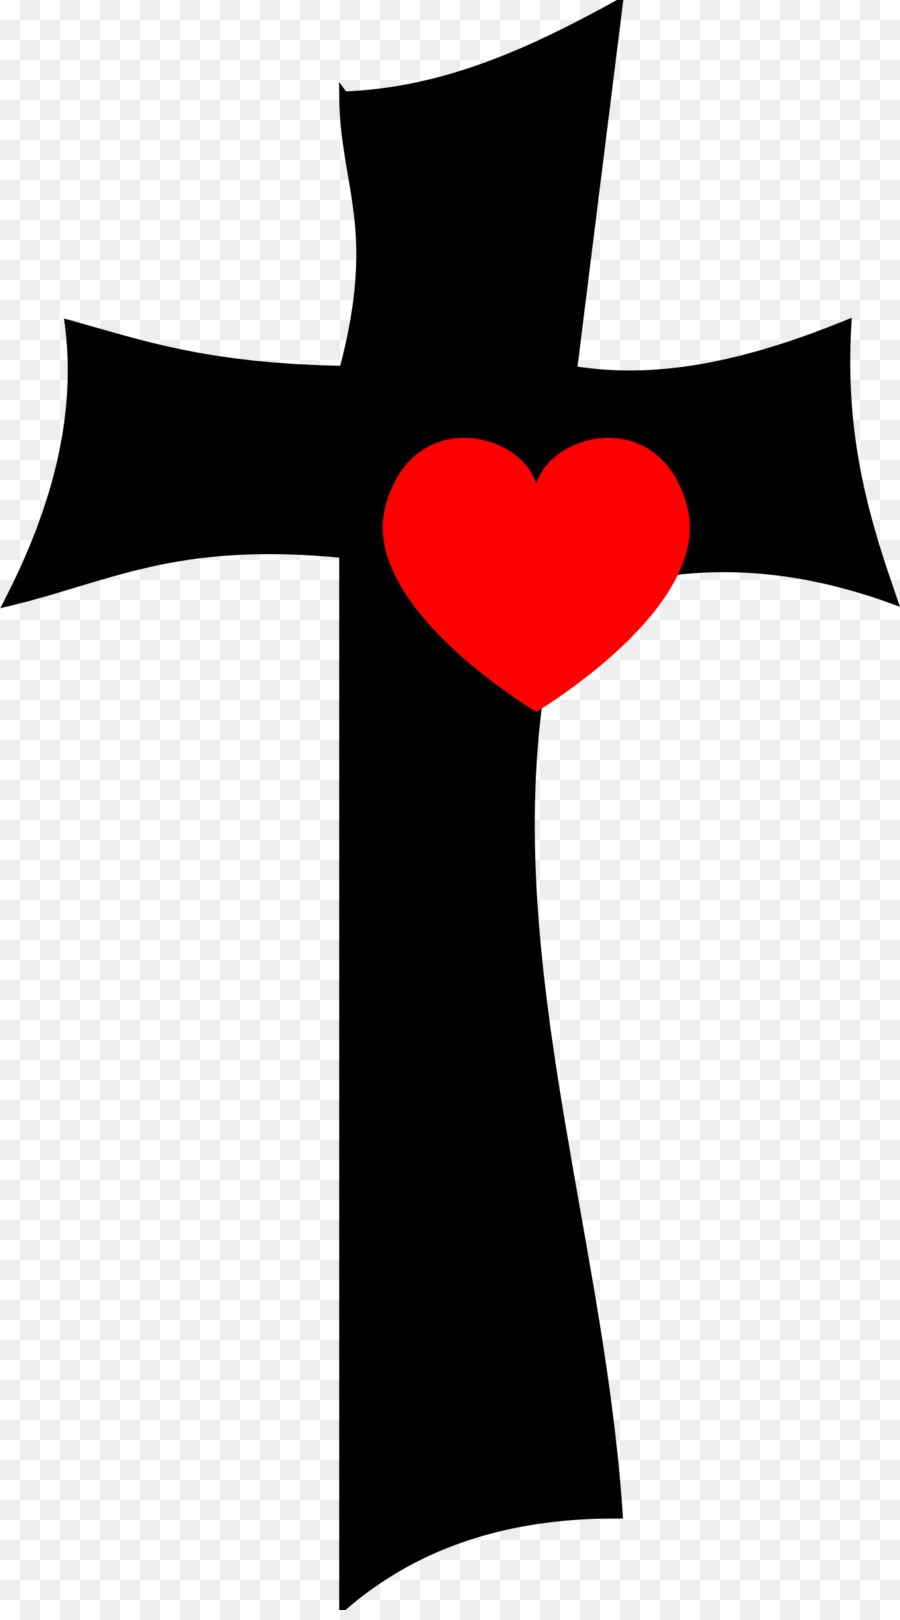 cross heart clip art hearts cross cliparts png download 1342 rh kisspng com Heart Clip Art Jesus Heart with Cross Inside